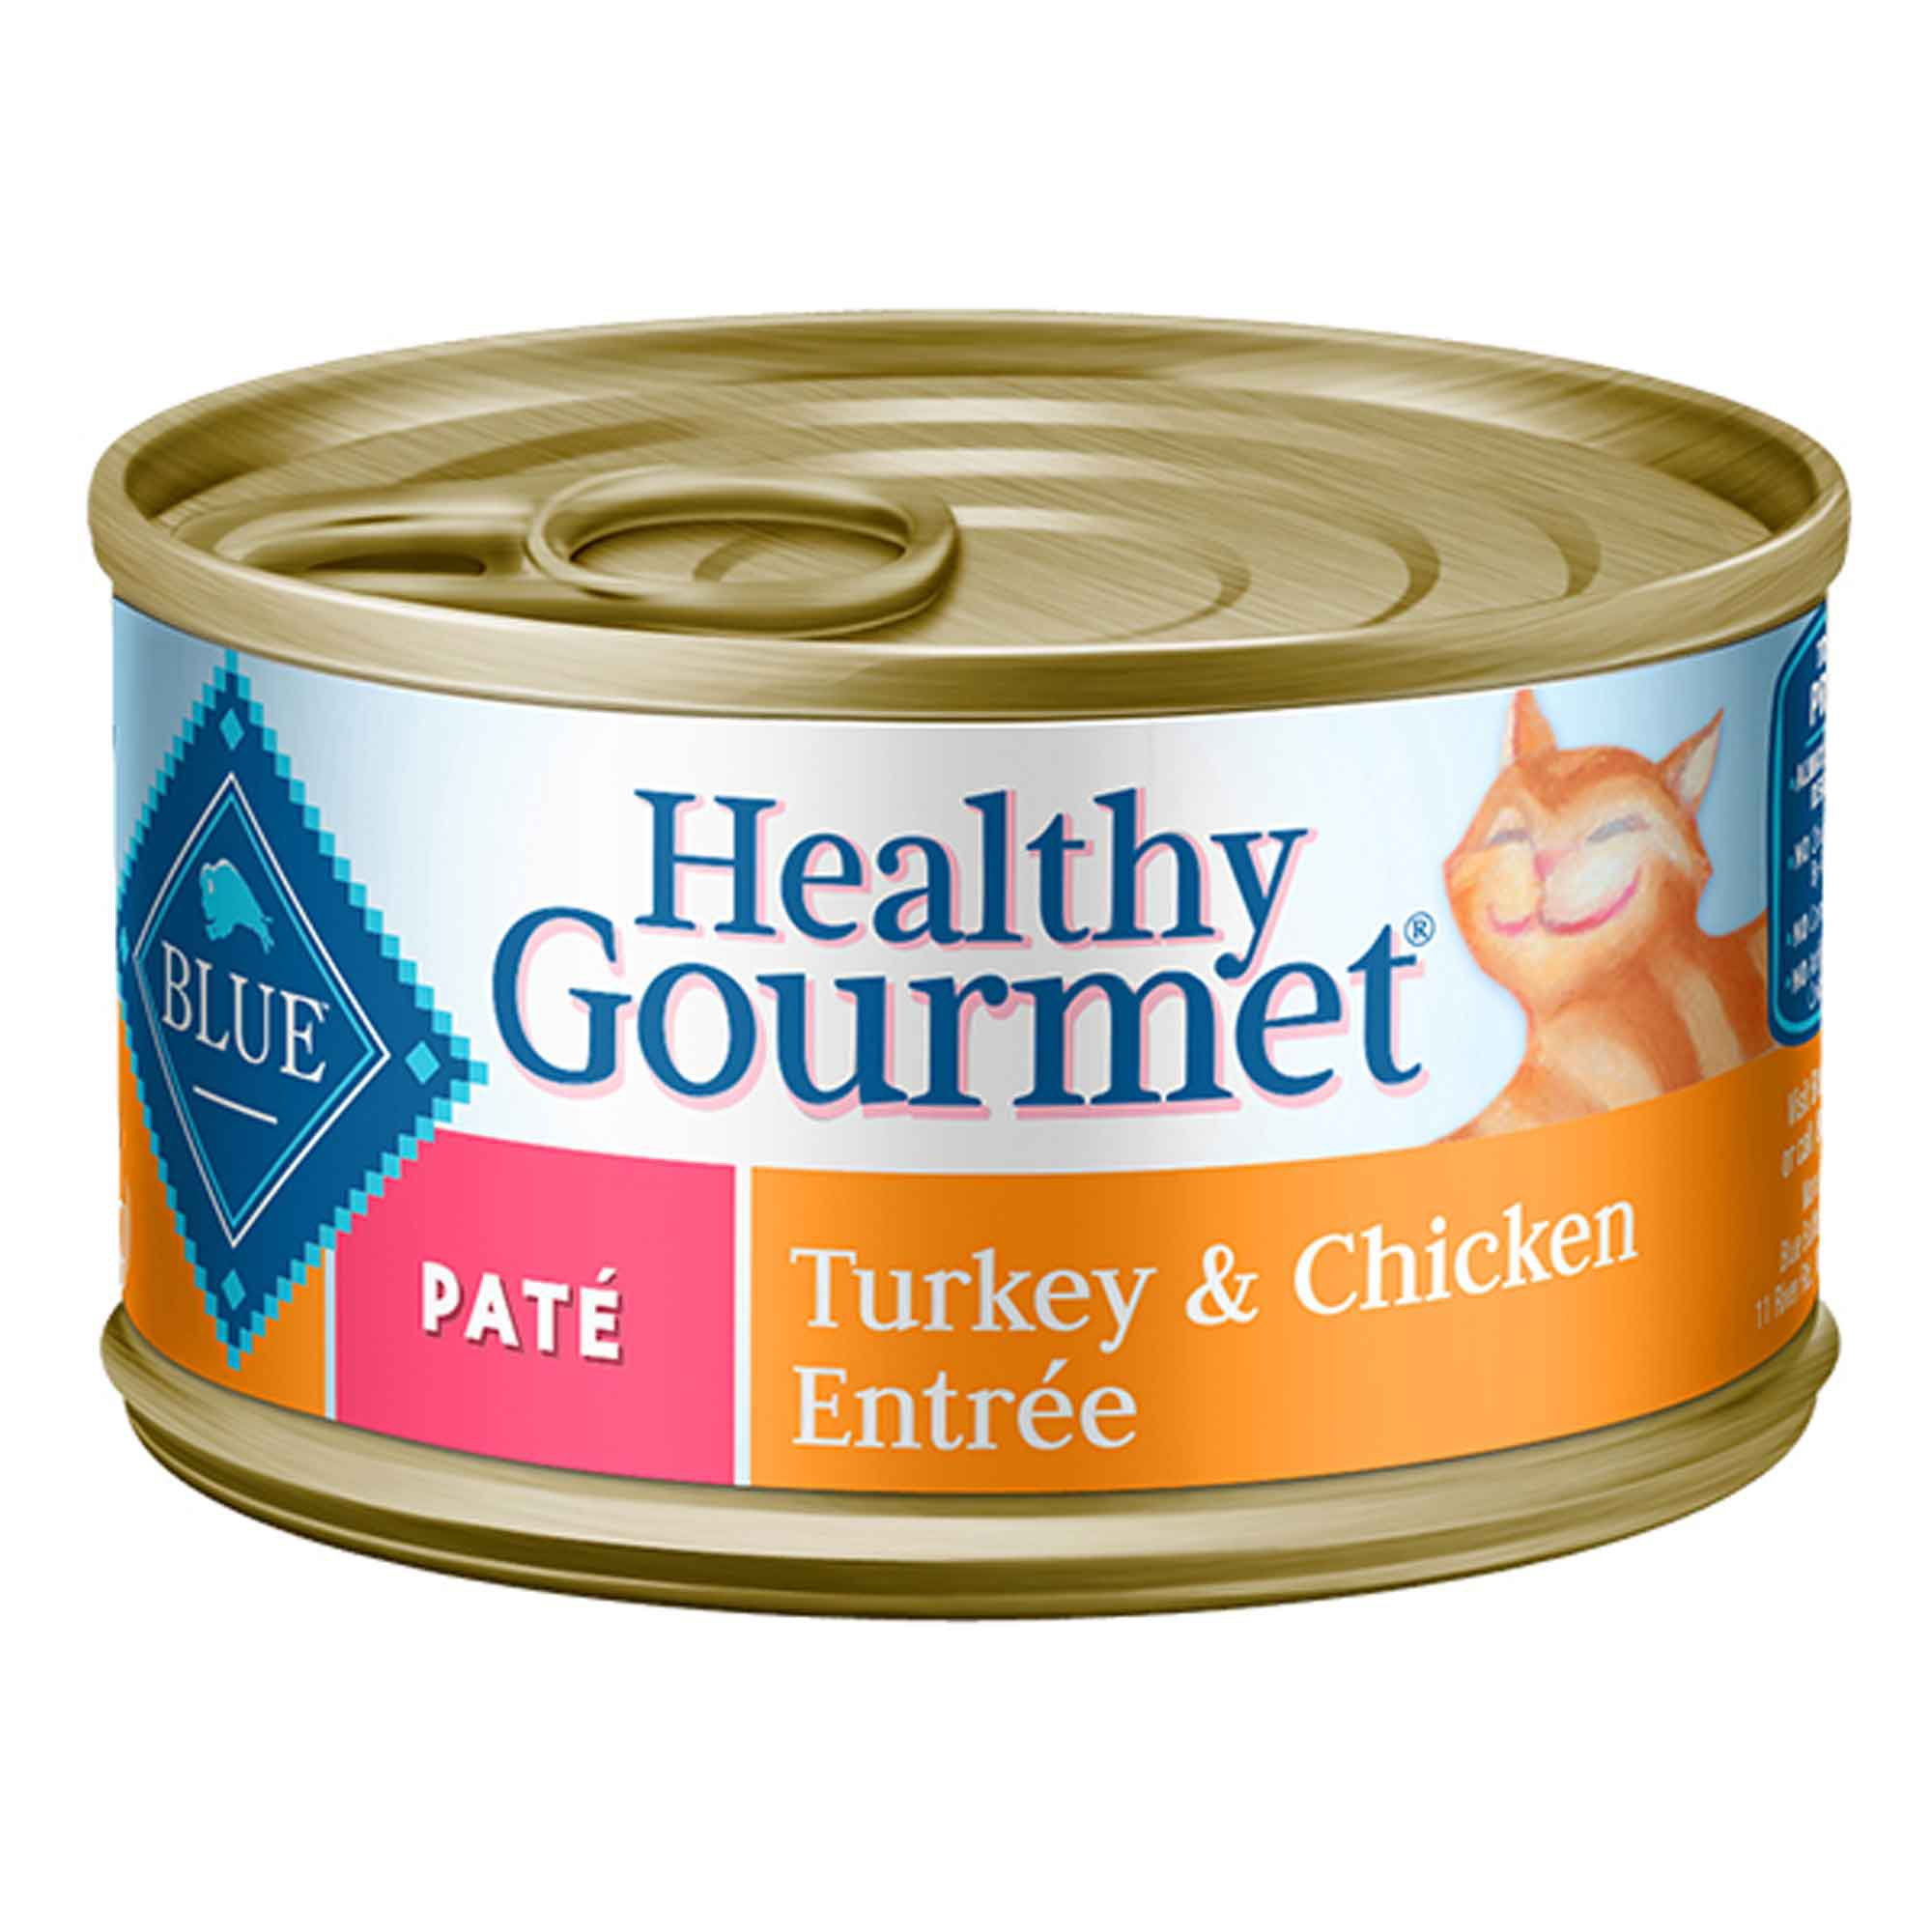 Blue Buffalo Healthy Gourmet Cat Food Turkey Chicken